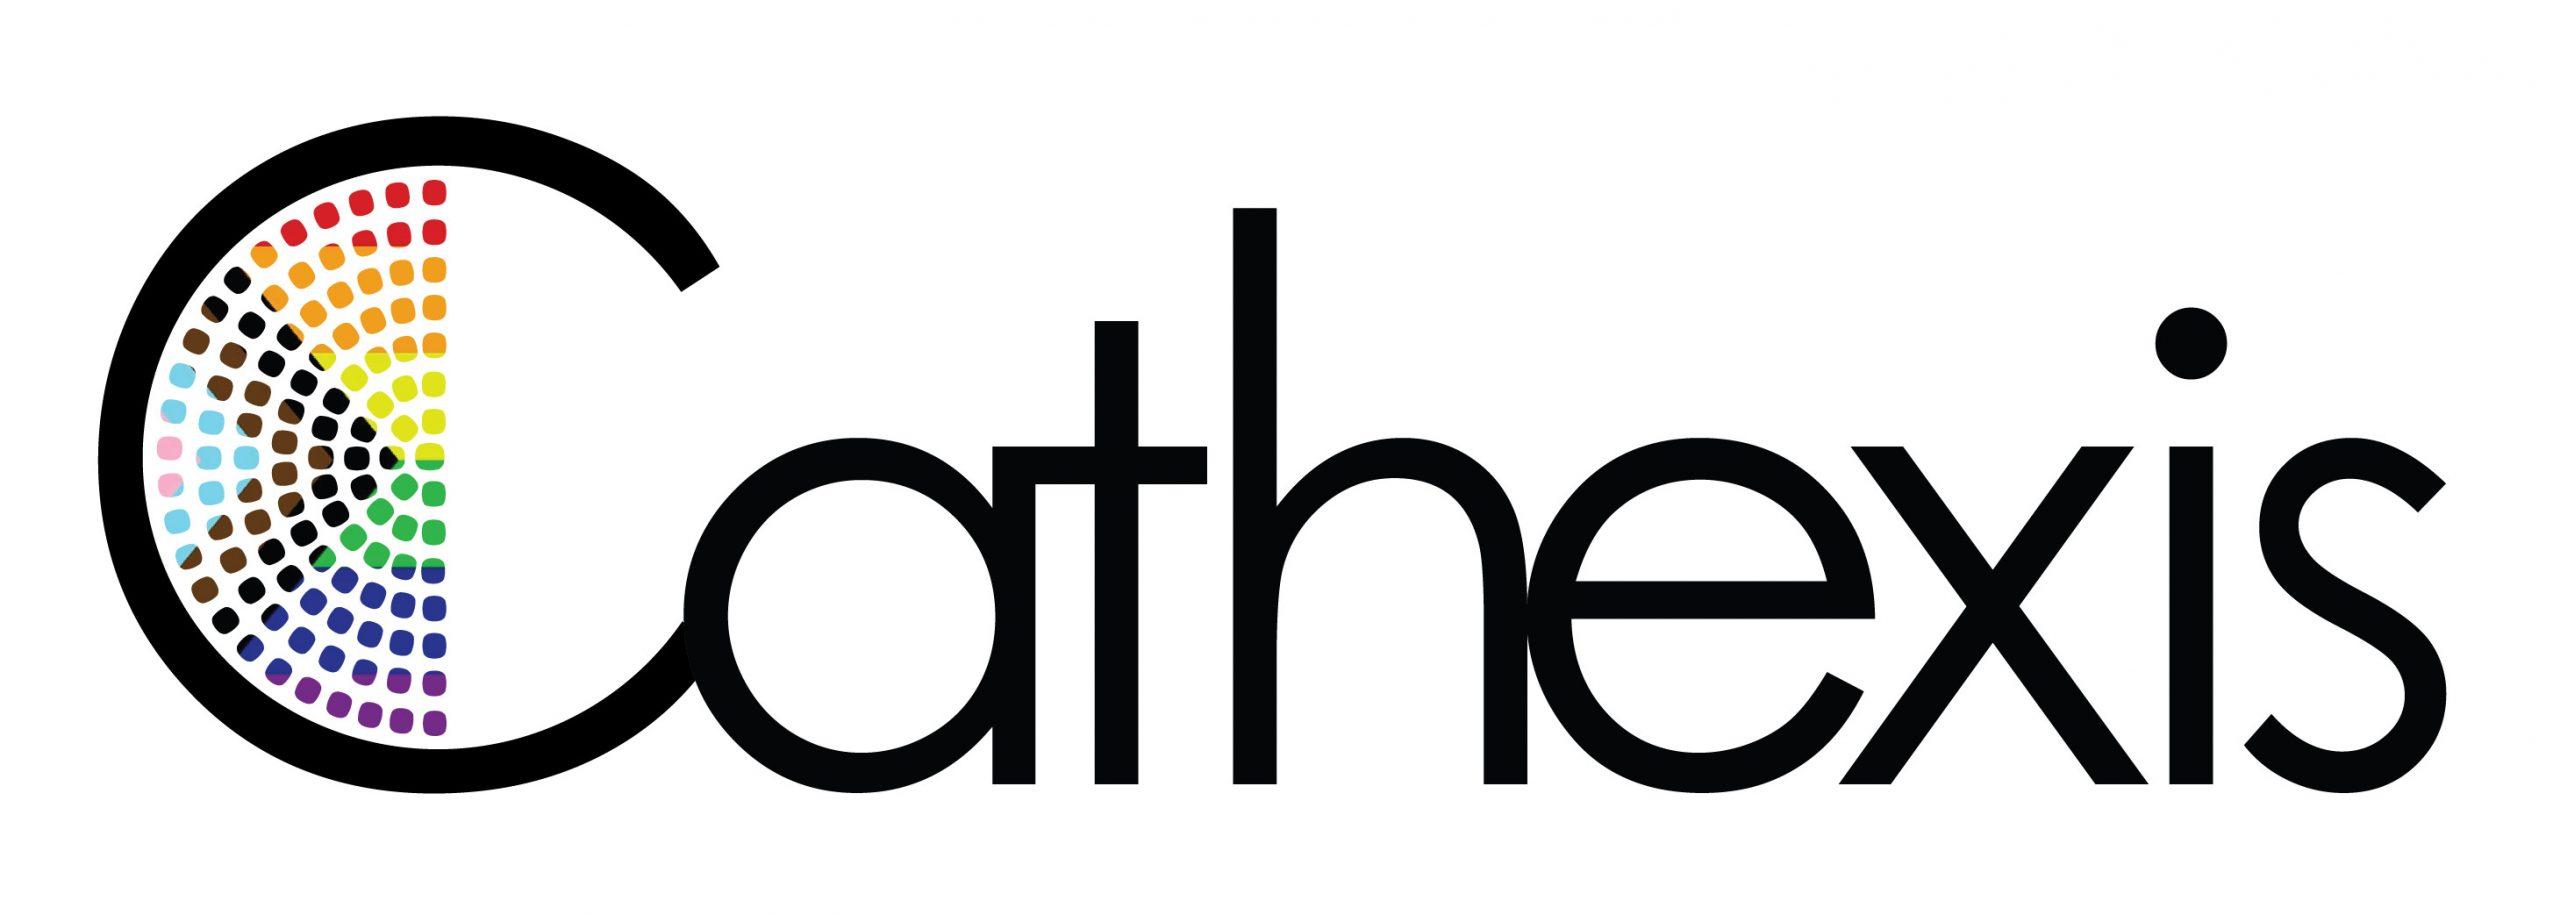 Cathexis Consulting